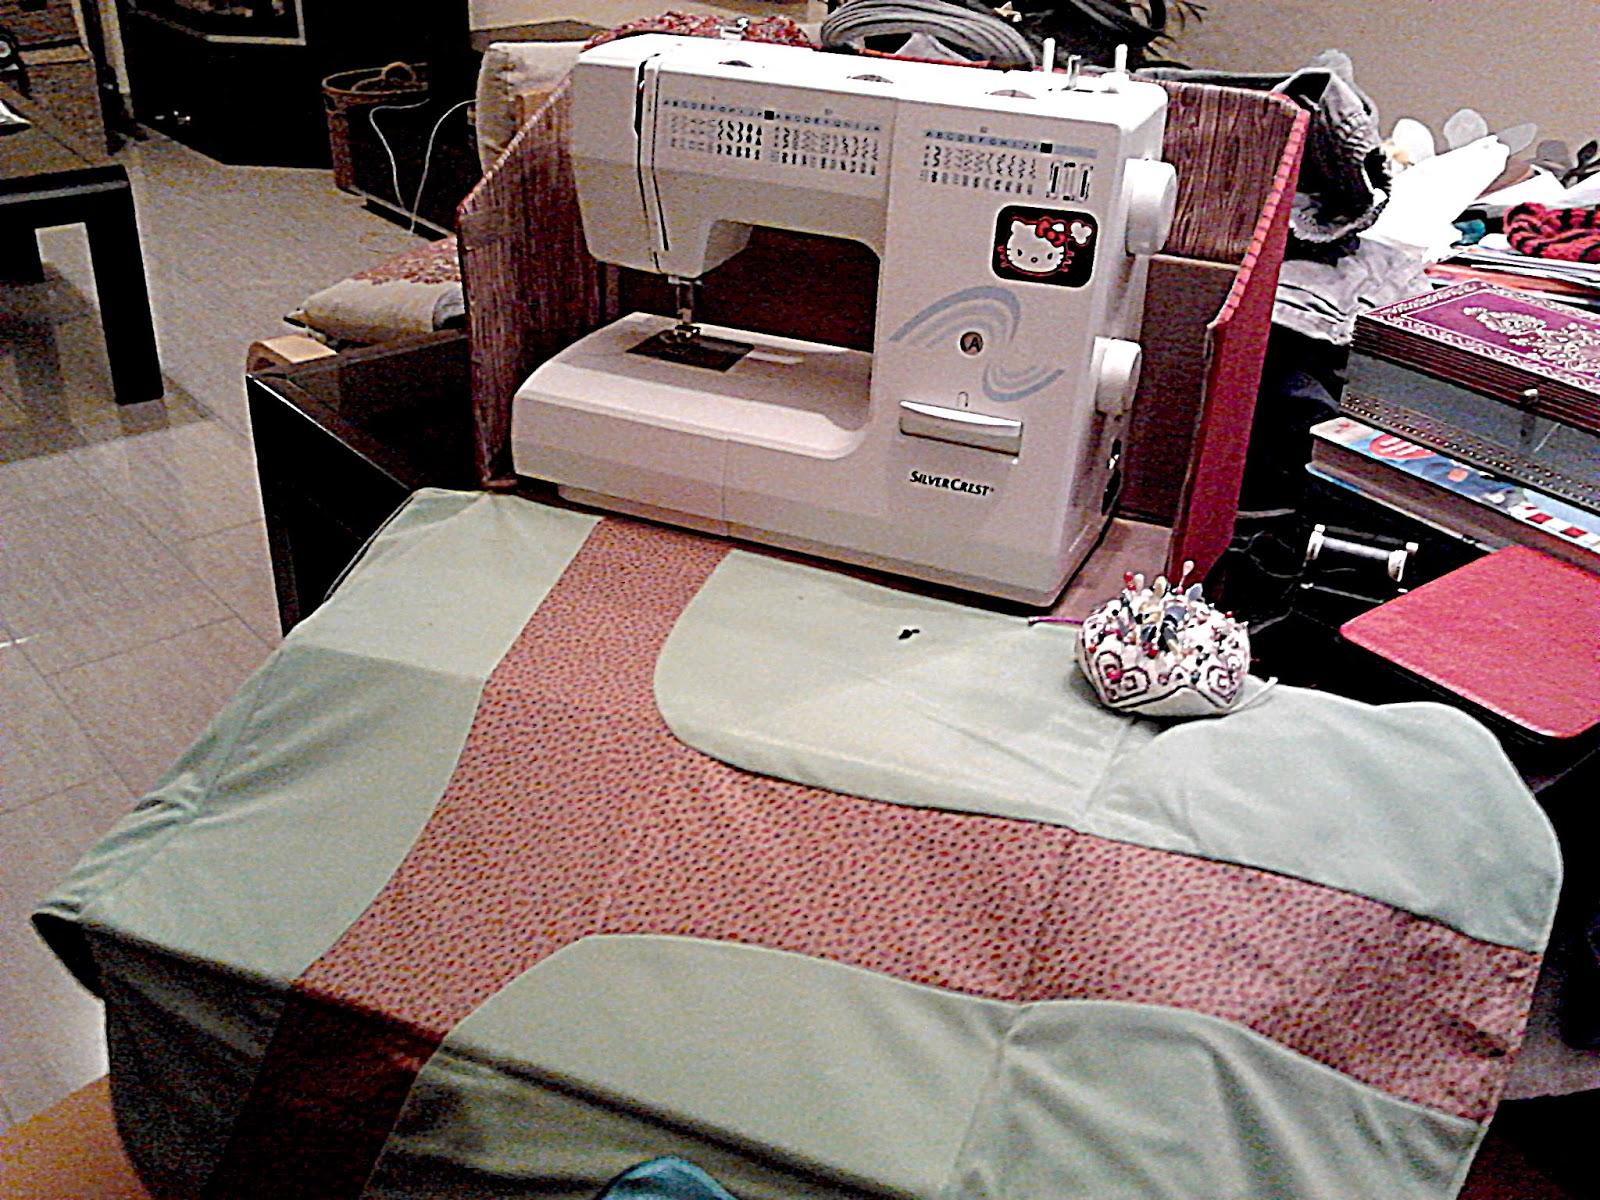 Una funda para la m quina de coser con la granja de - Mesa para maquina de coser ikea ...